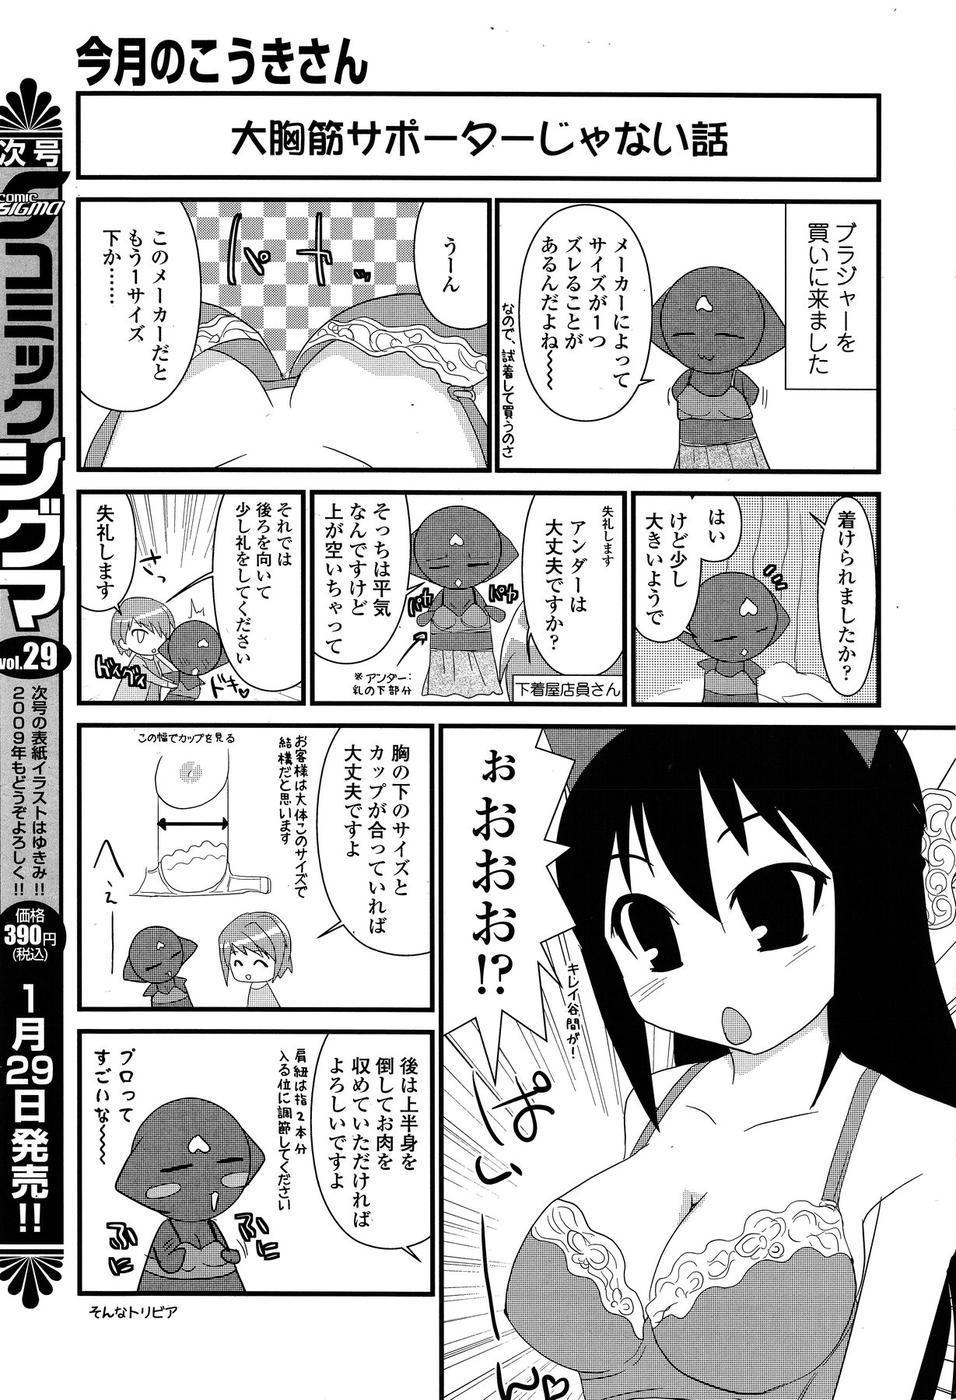 COMIC SIGMA 2009-01 Vol.28 149